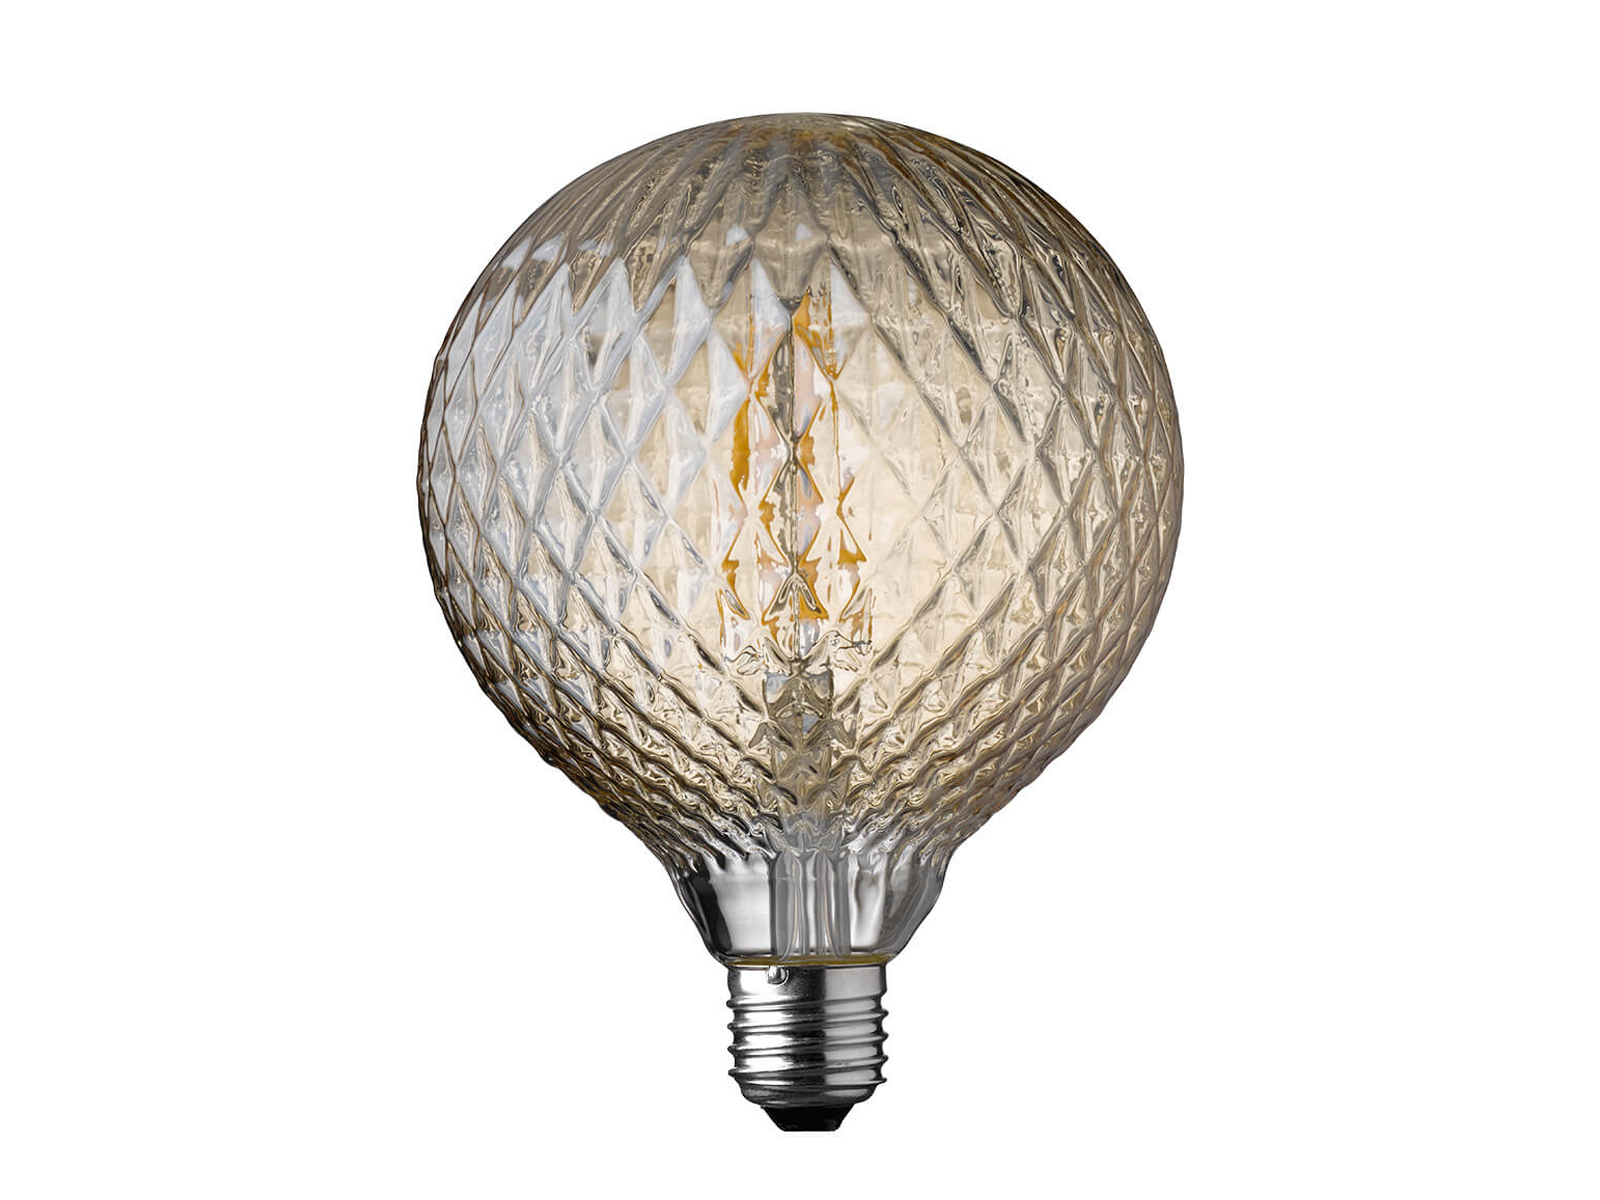 LED Lampe Struktur Retro 4 Watt 300 Lumen 1800 Kelvin E27 ...